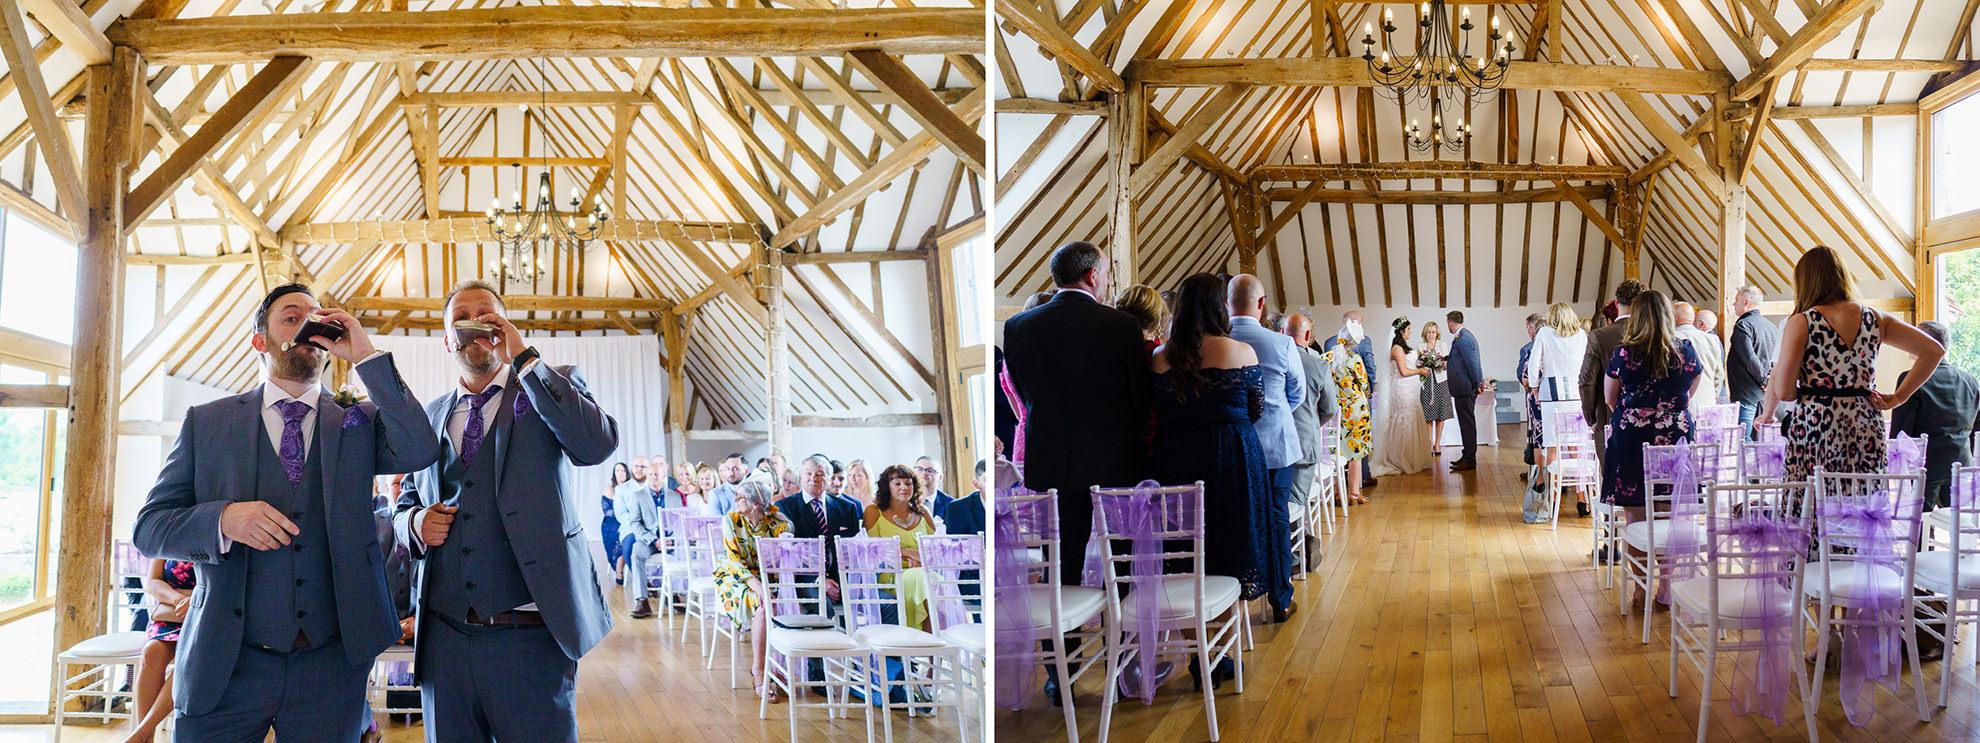 dyptich inside skylark golf course barn with wedding ceremony